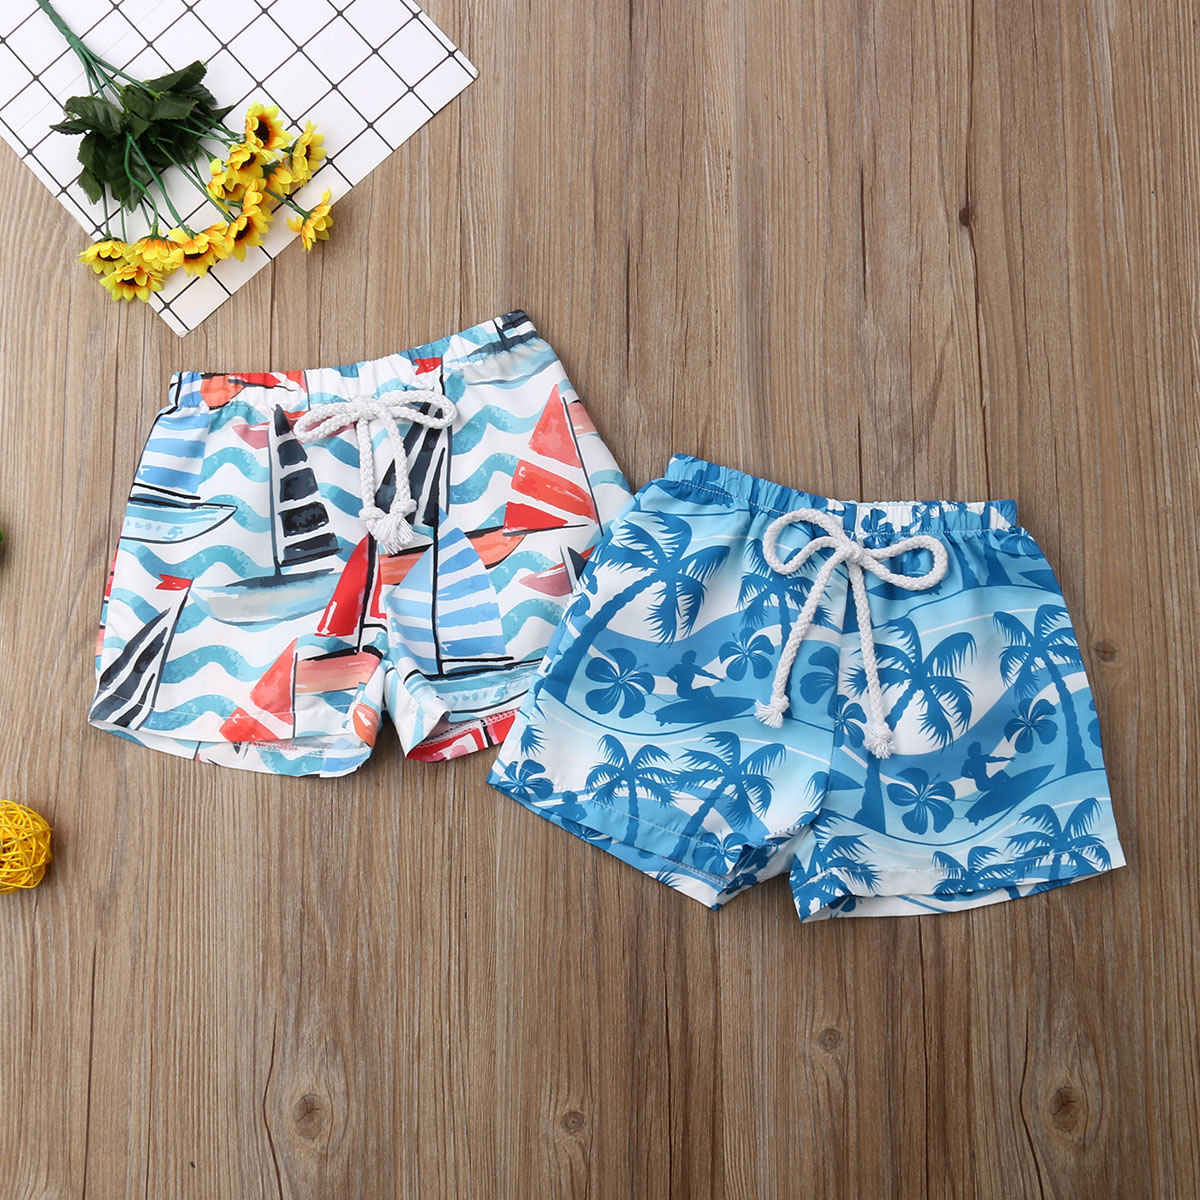 Schbbbta Kids Boys Girls Tie Dye Soft Comfy Fleece Loose Lounge Pants 2-13 Years